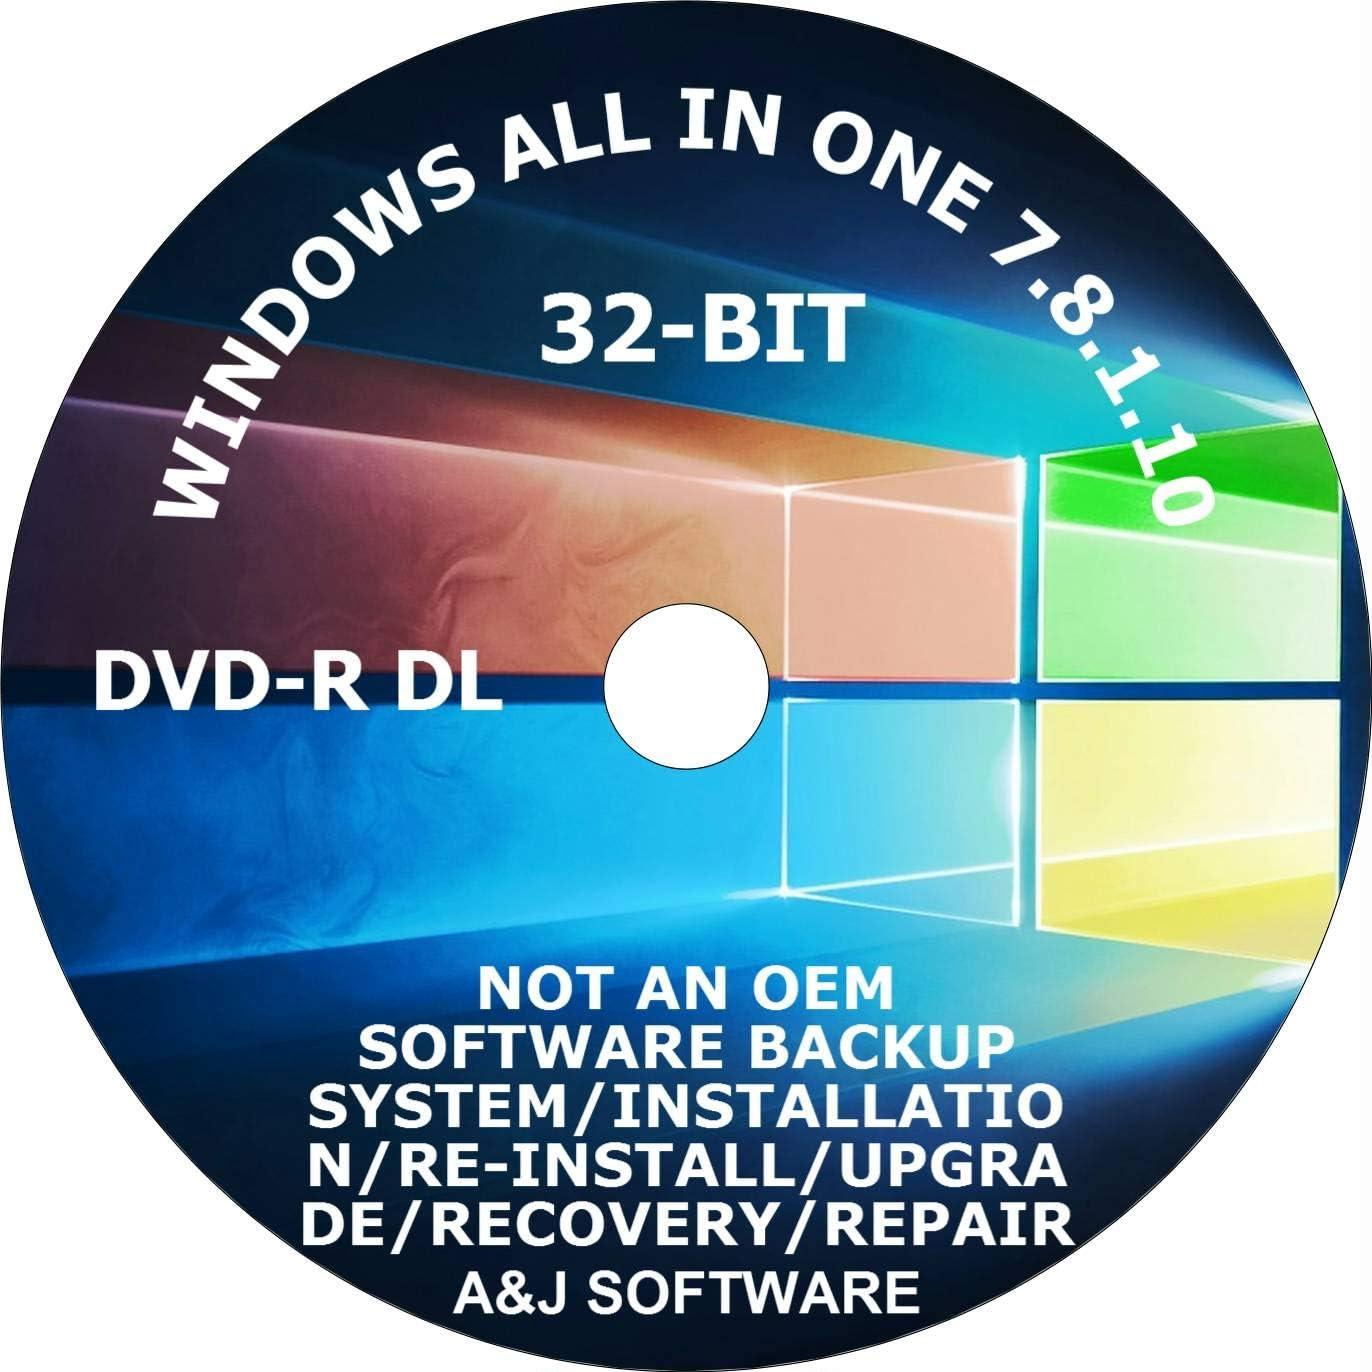 WINDOWS 7 8.1 10 DVD SUITE SET. 32 F 25% Rare OFF FRESH RECOVERY FACTORY -BIT